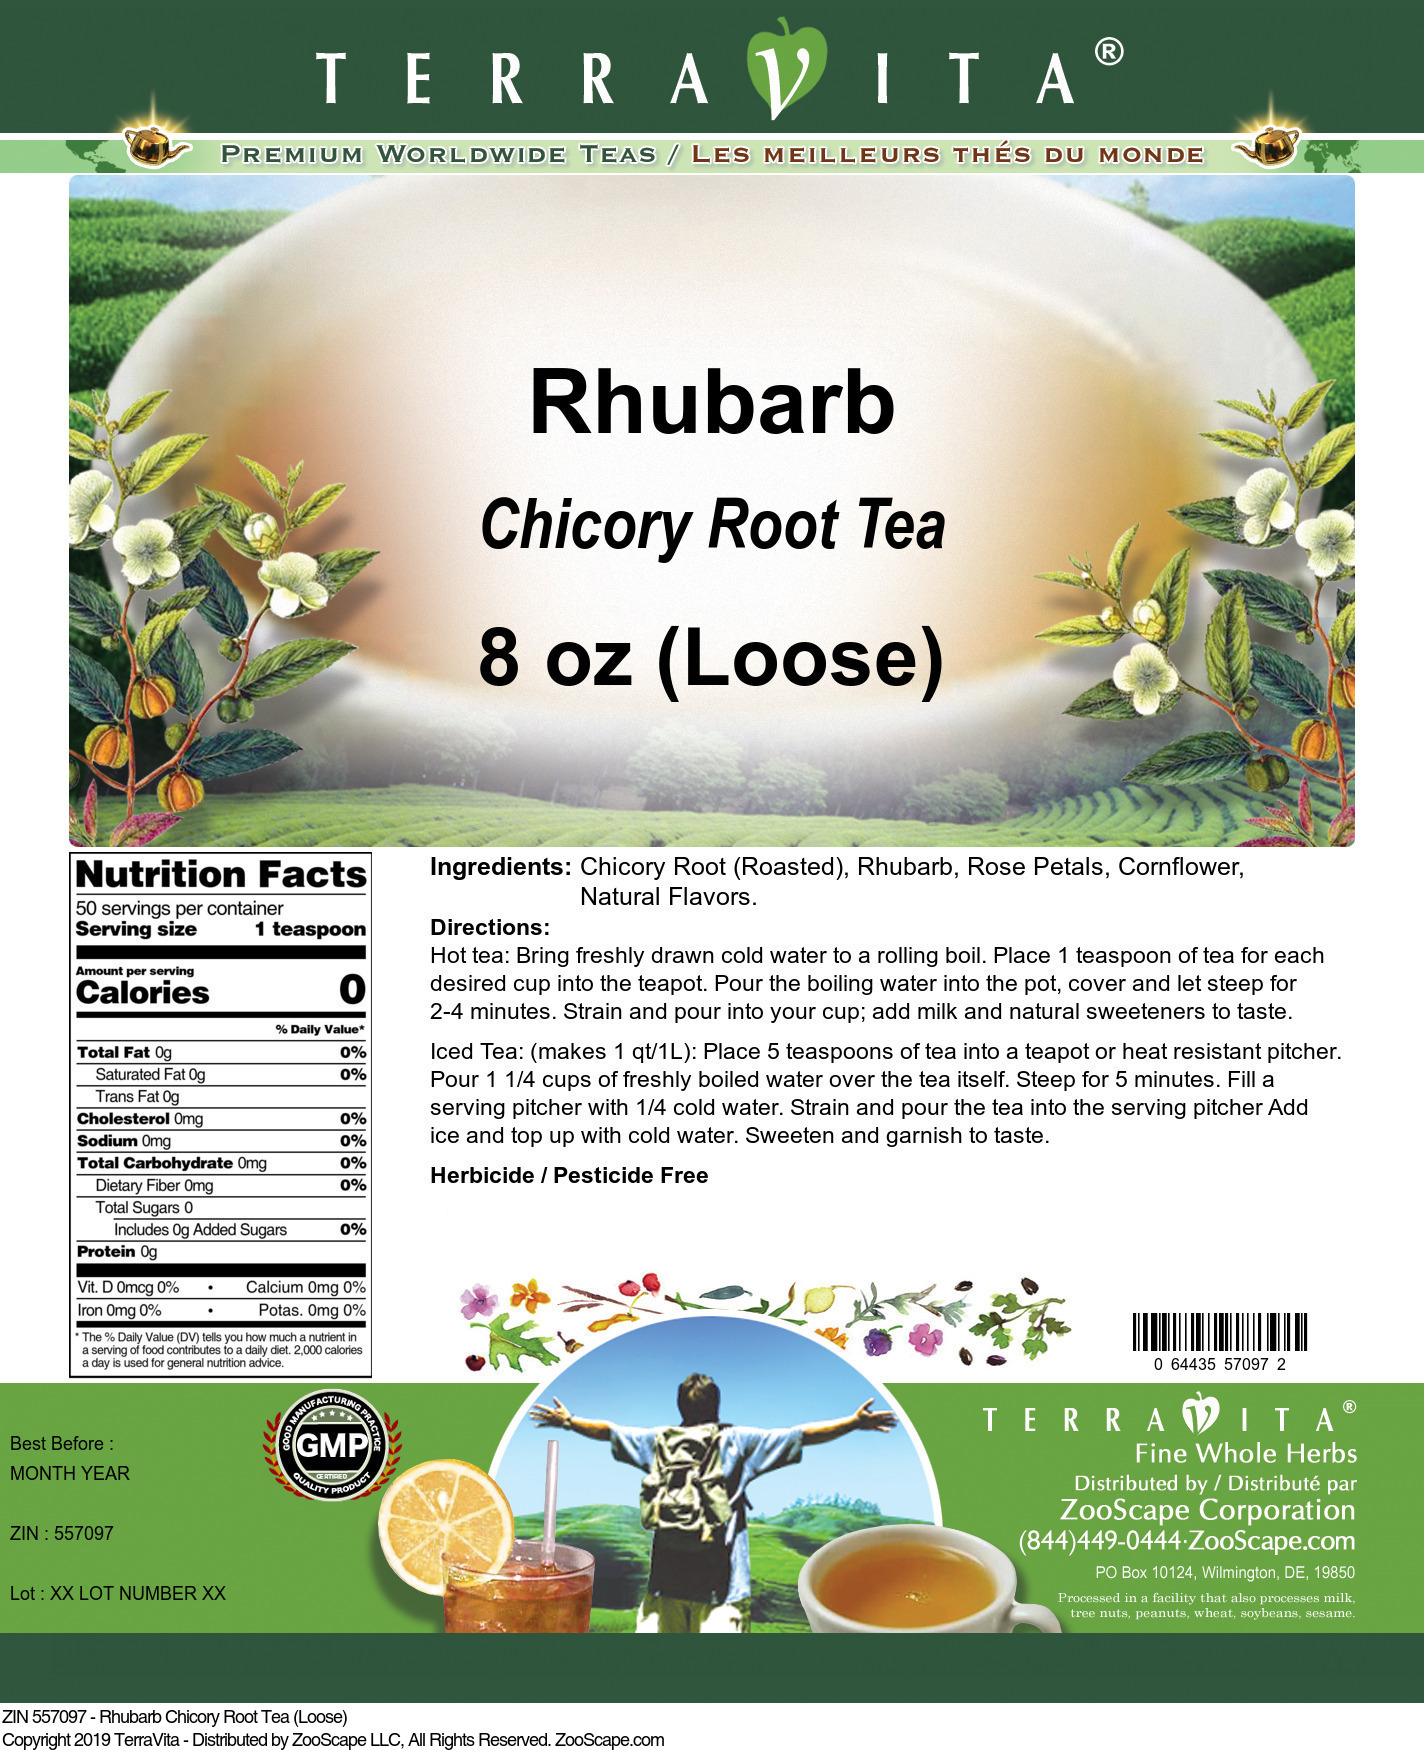 Rhubarb Chicory Root